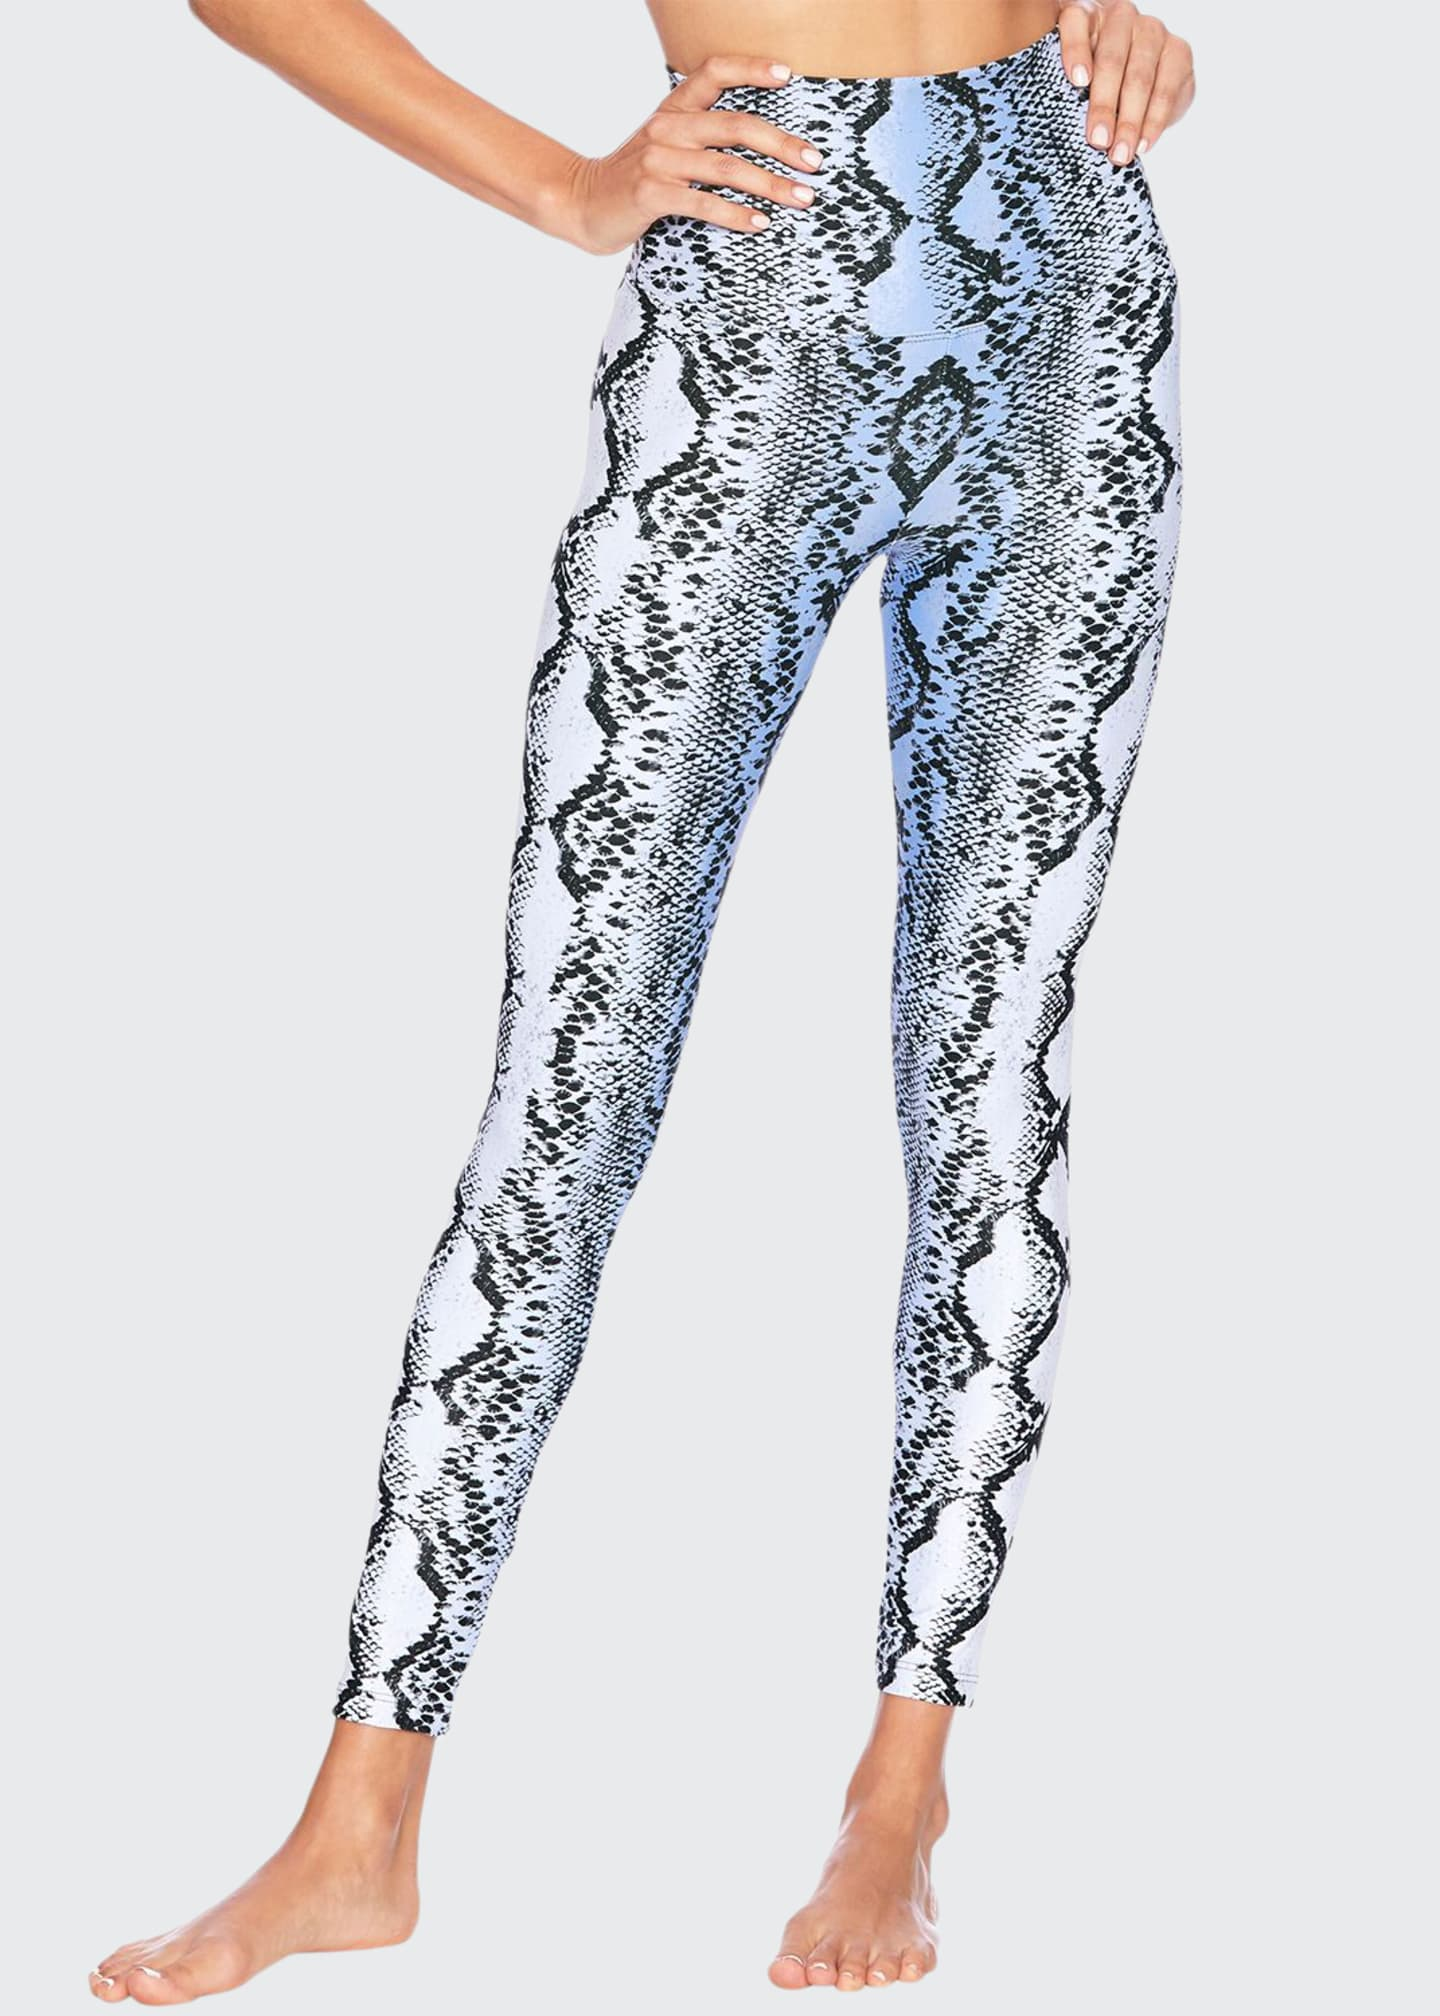 Beach Riot Snake-Print High-Rise Leggings